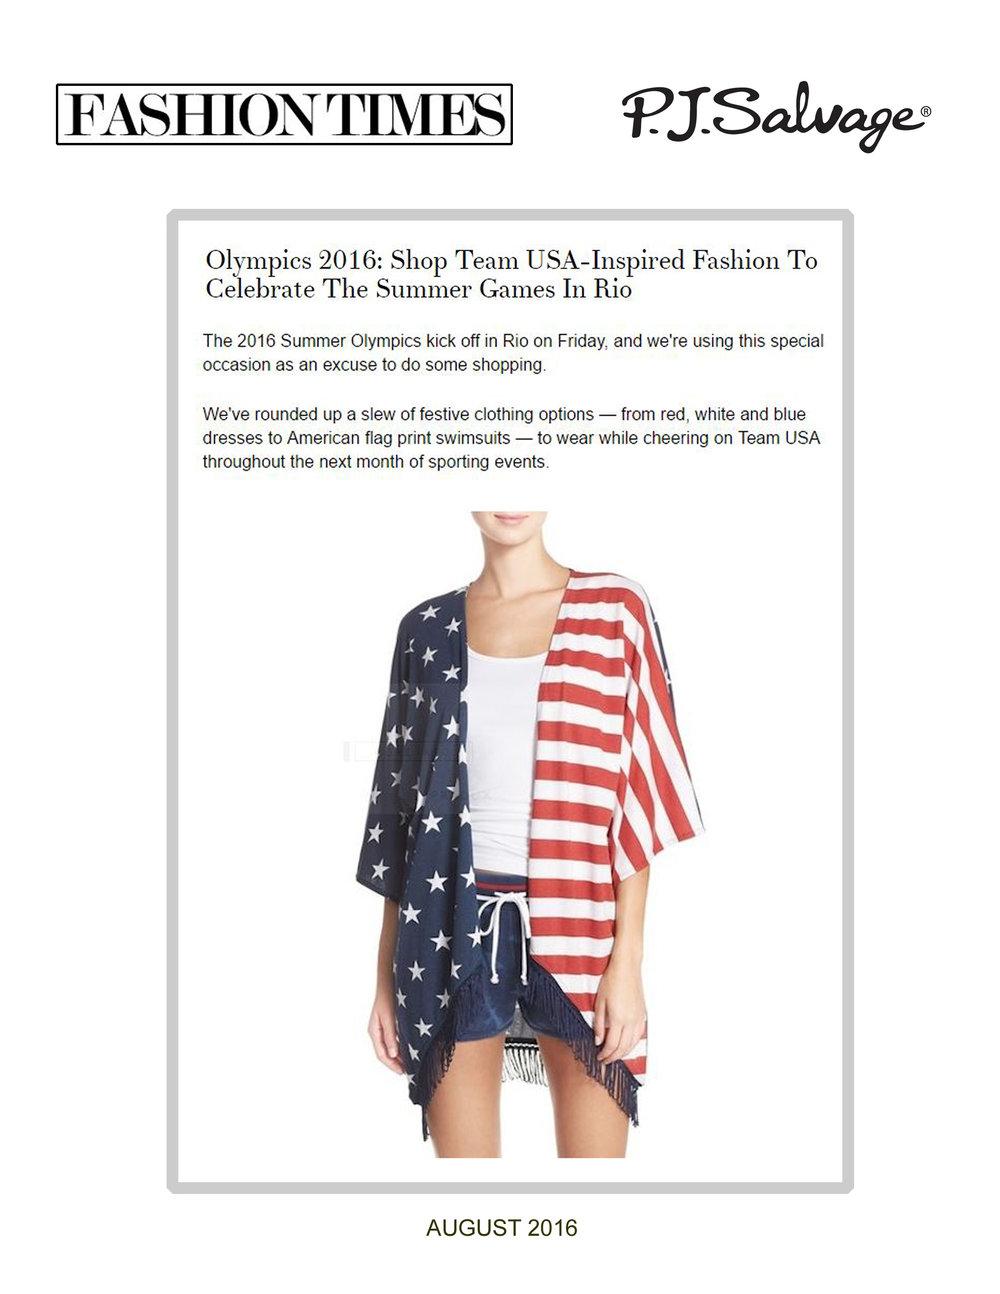 FashionTimes_August2016.jpg